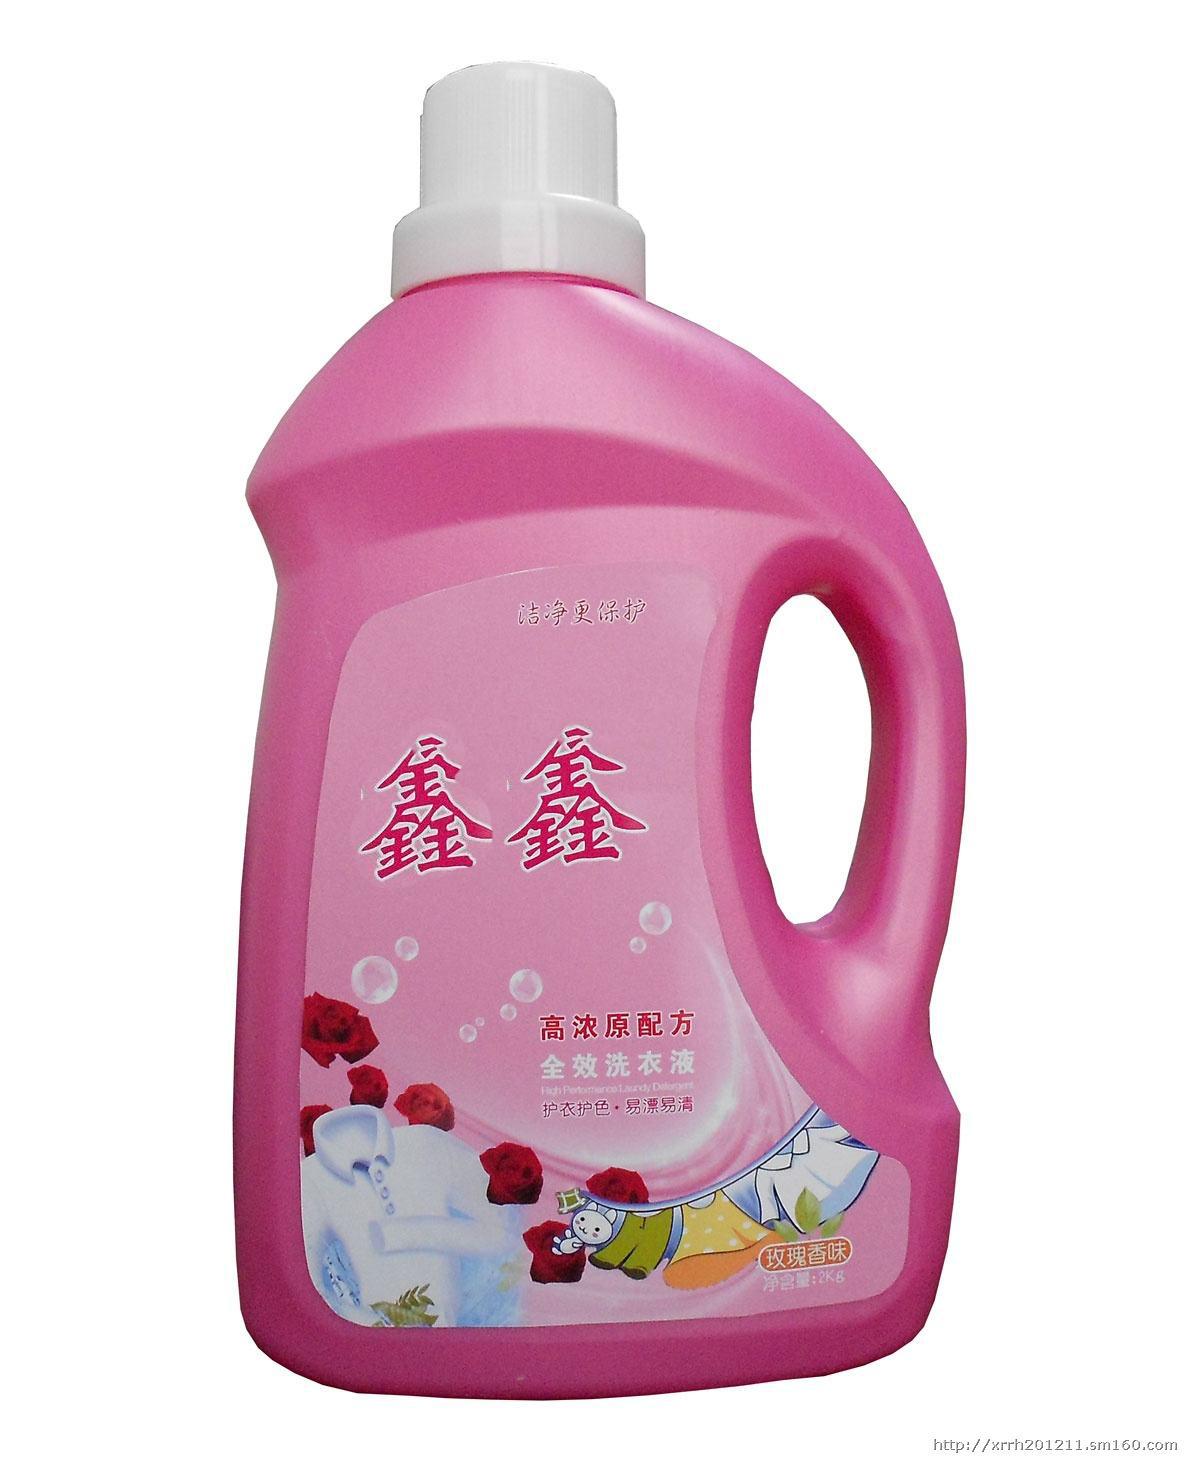 China Liquid Private Label Liquid Detergent for Household